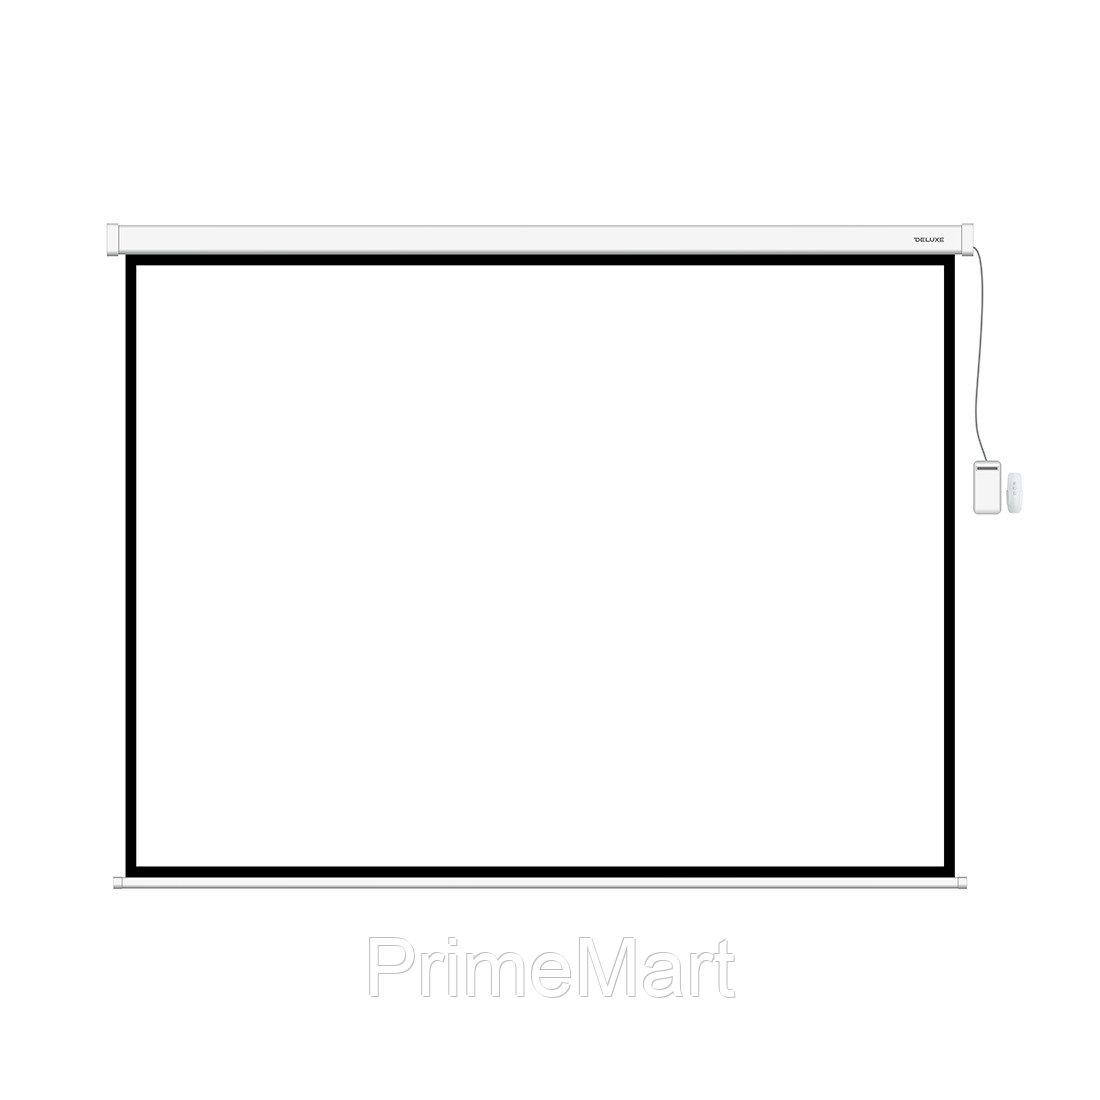 Экран моторизированный, Deluxe, Раб. поверхность 195х195 см., 1:1, Matt white, Чёрный